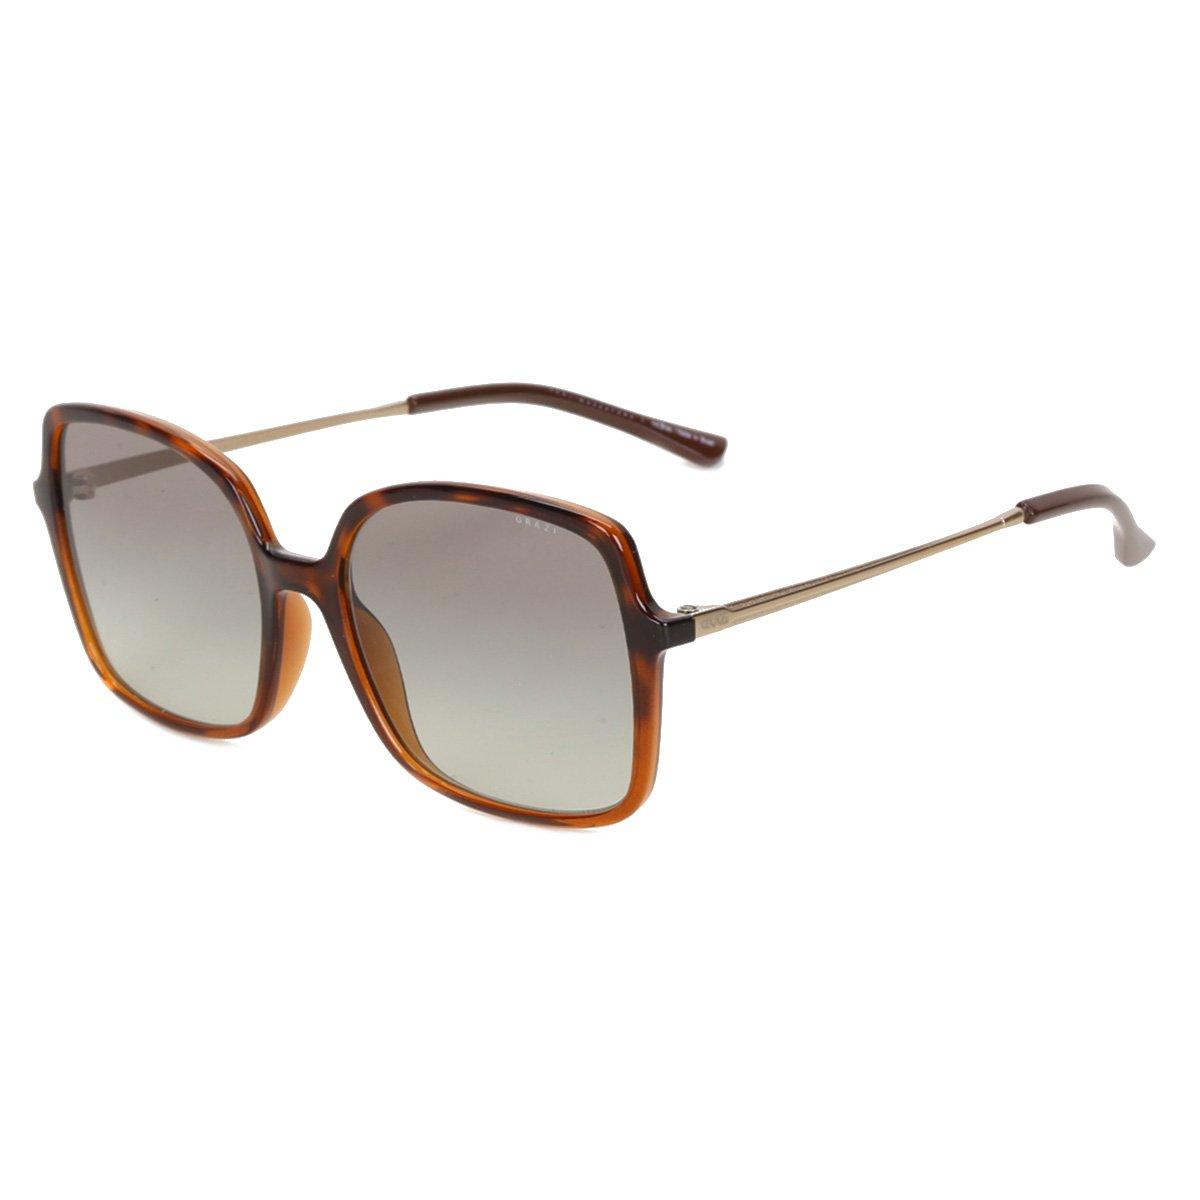 Óculos de Sol Grazi Havana Quadrado Degradê Feminino